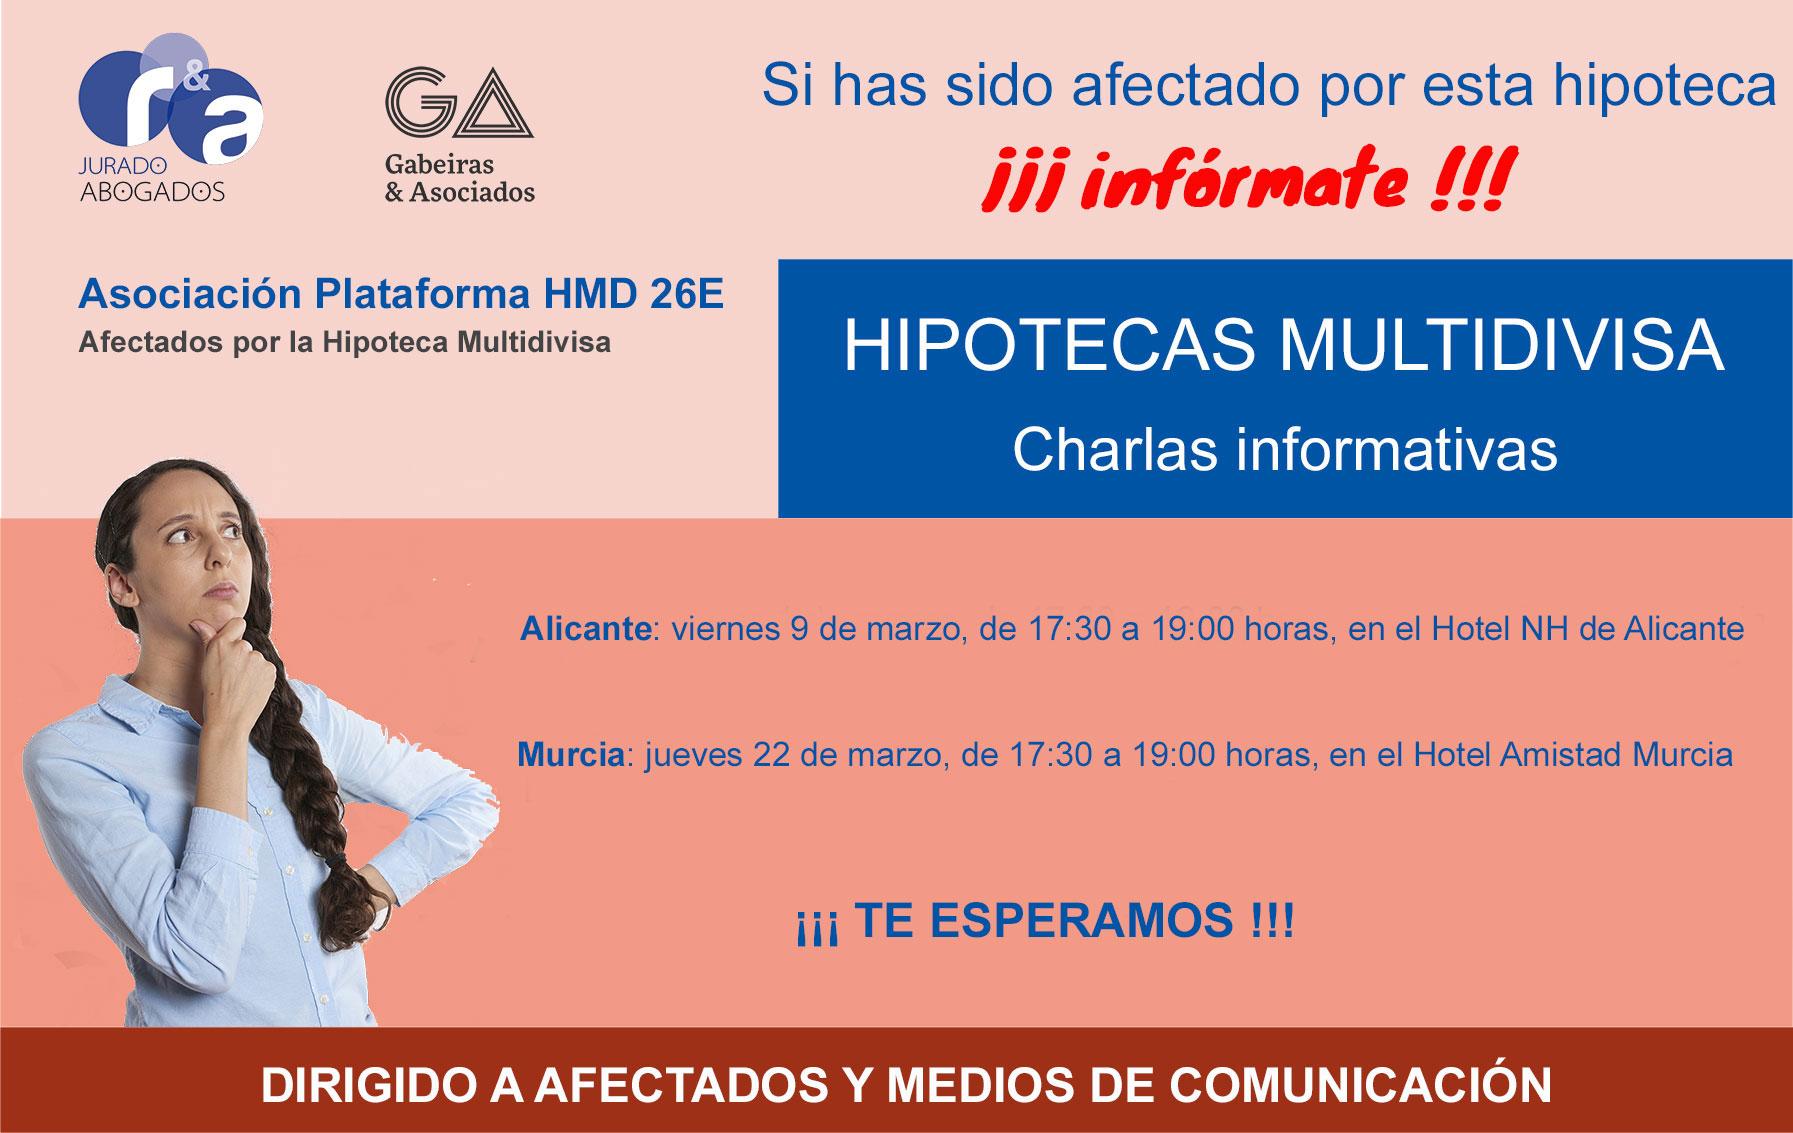 Hipotecas Multidivsa